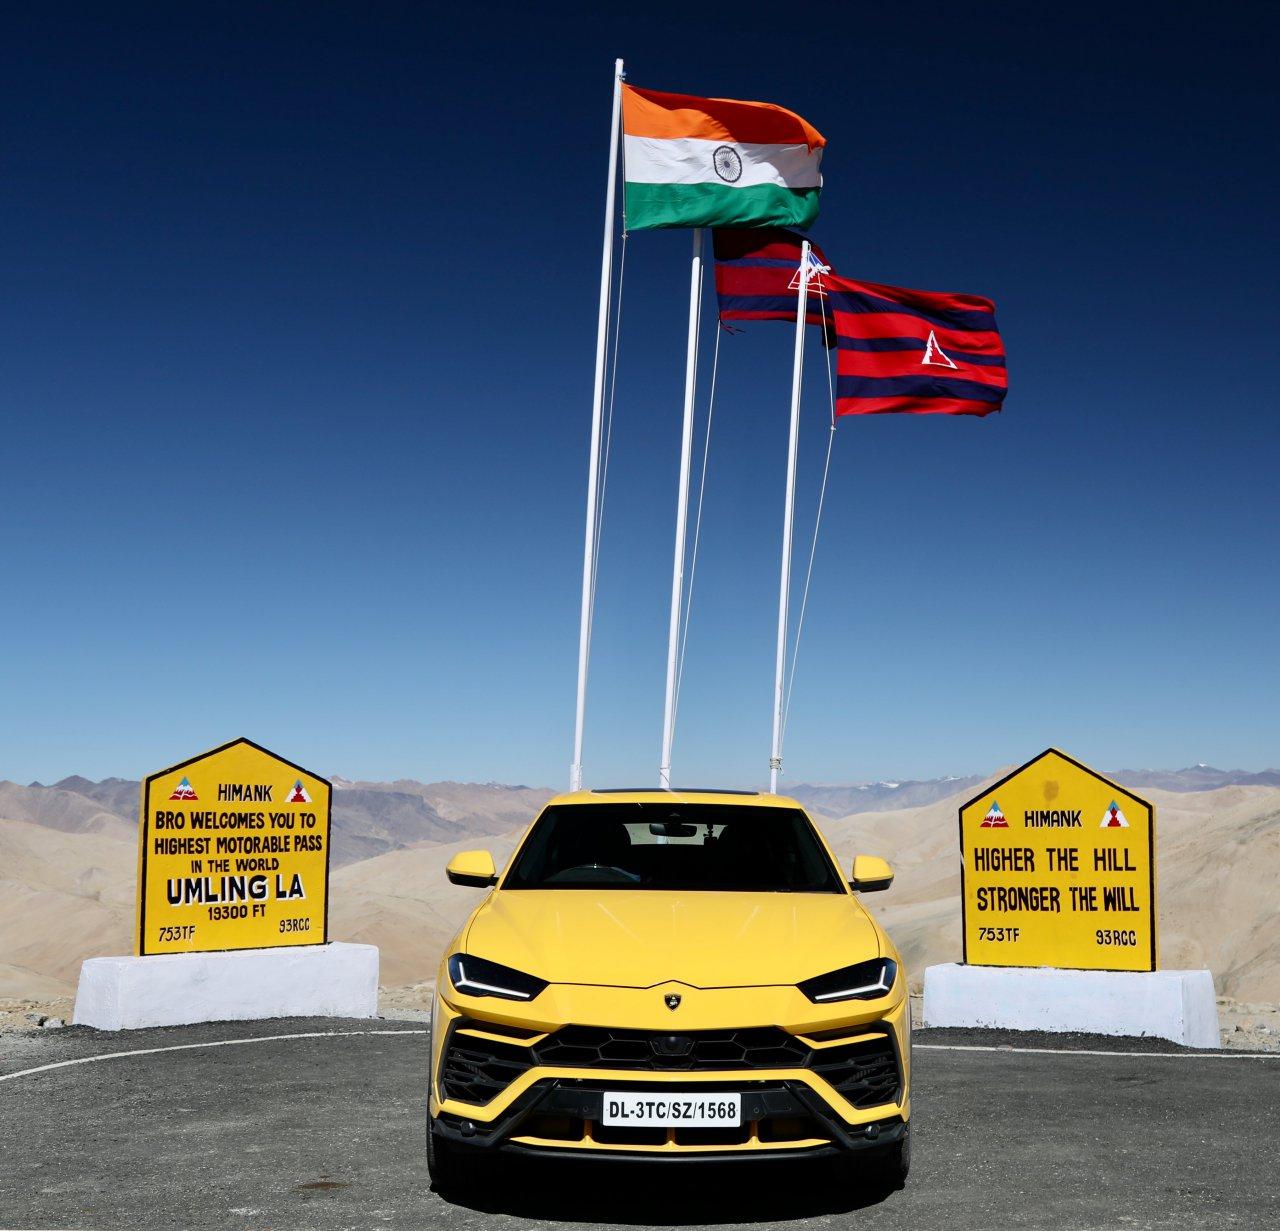 Lamborghini, Lamborghini conquers world's highest drivable road, ClassicCars.com Journal